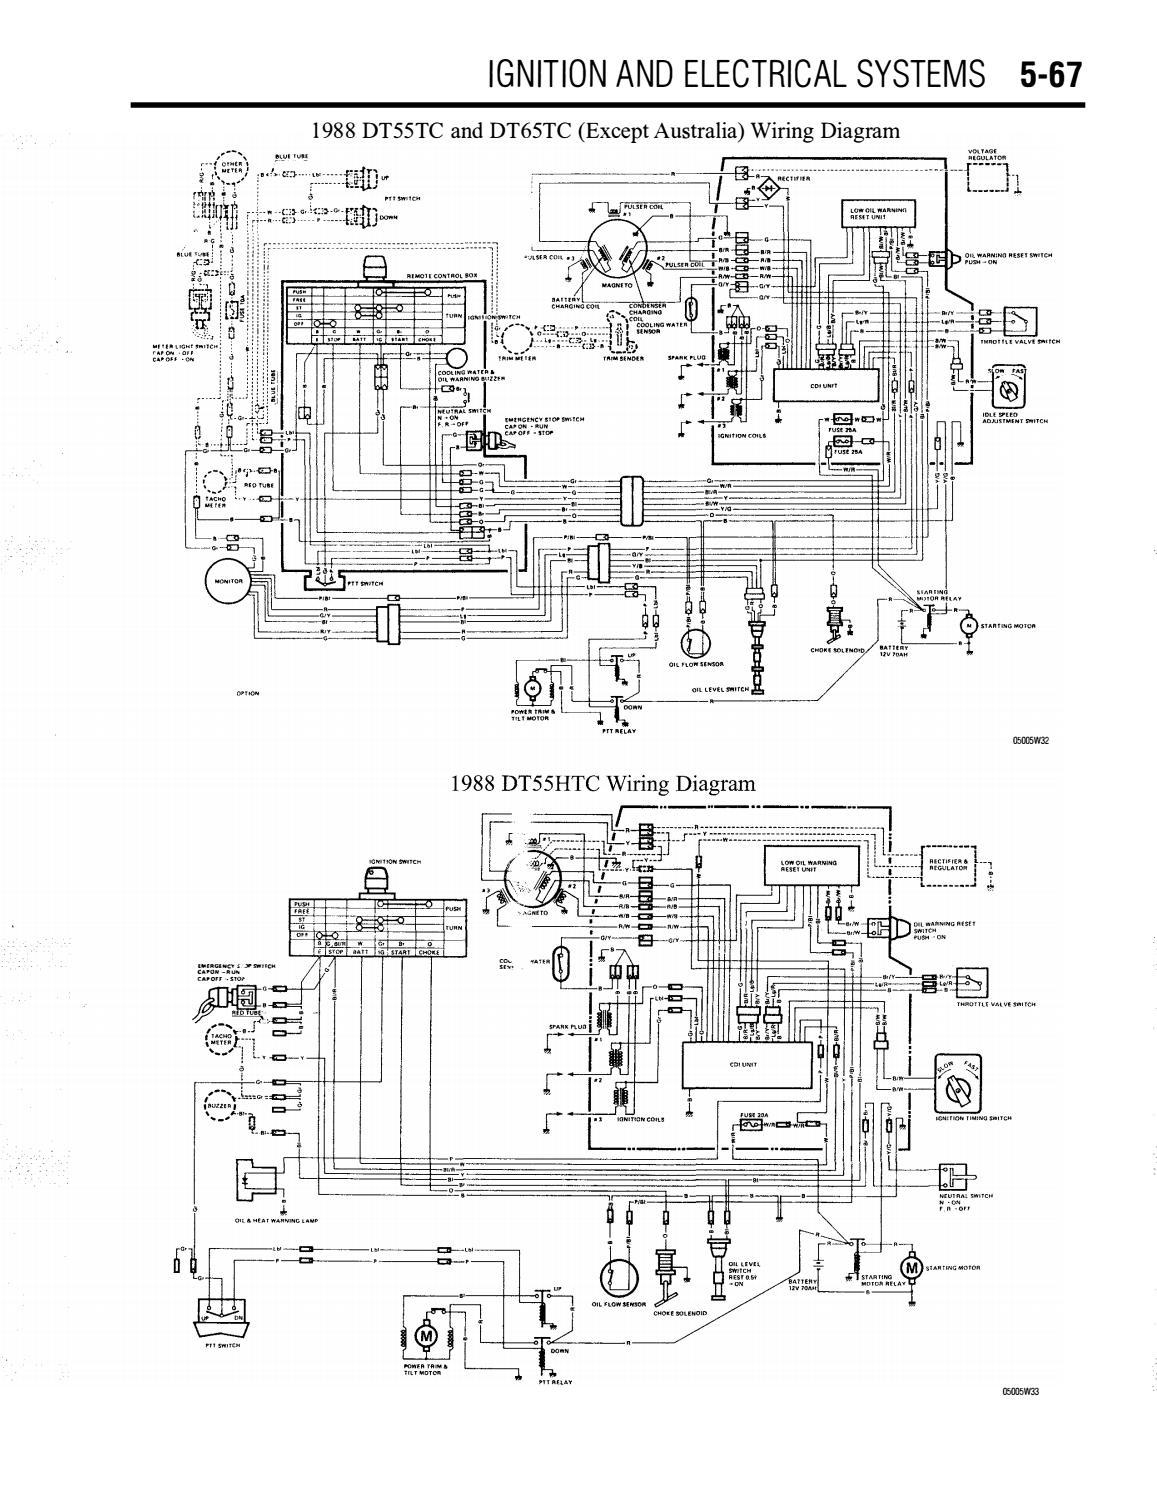 suzuki outboard workshop service manual - all motors by glsense - issuu  suzuki outboard workshop service manual - all motors by glsense - issuu